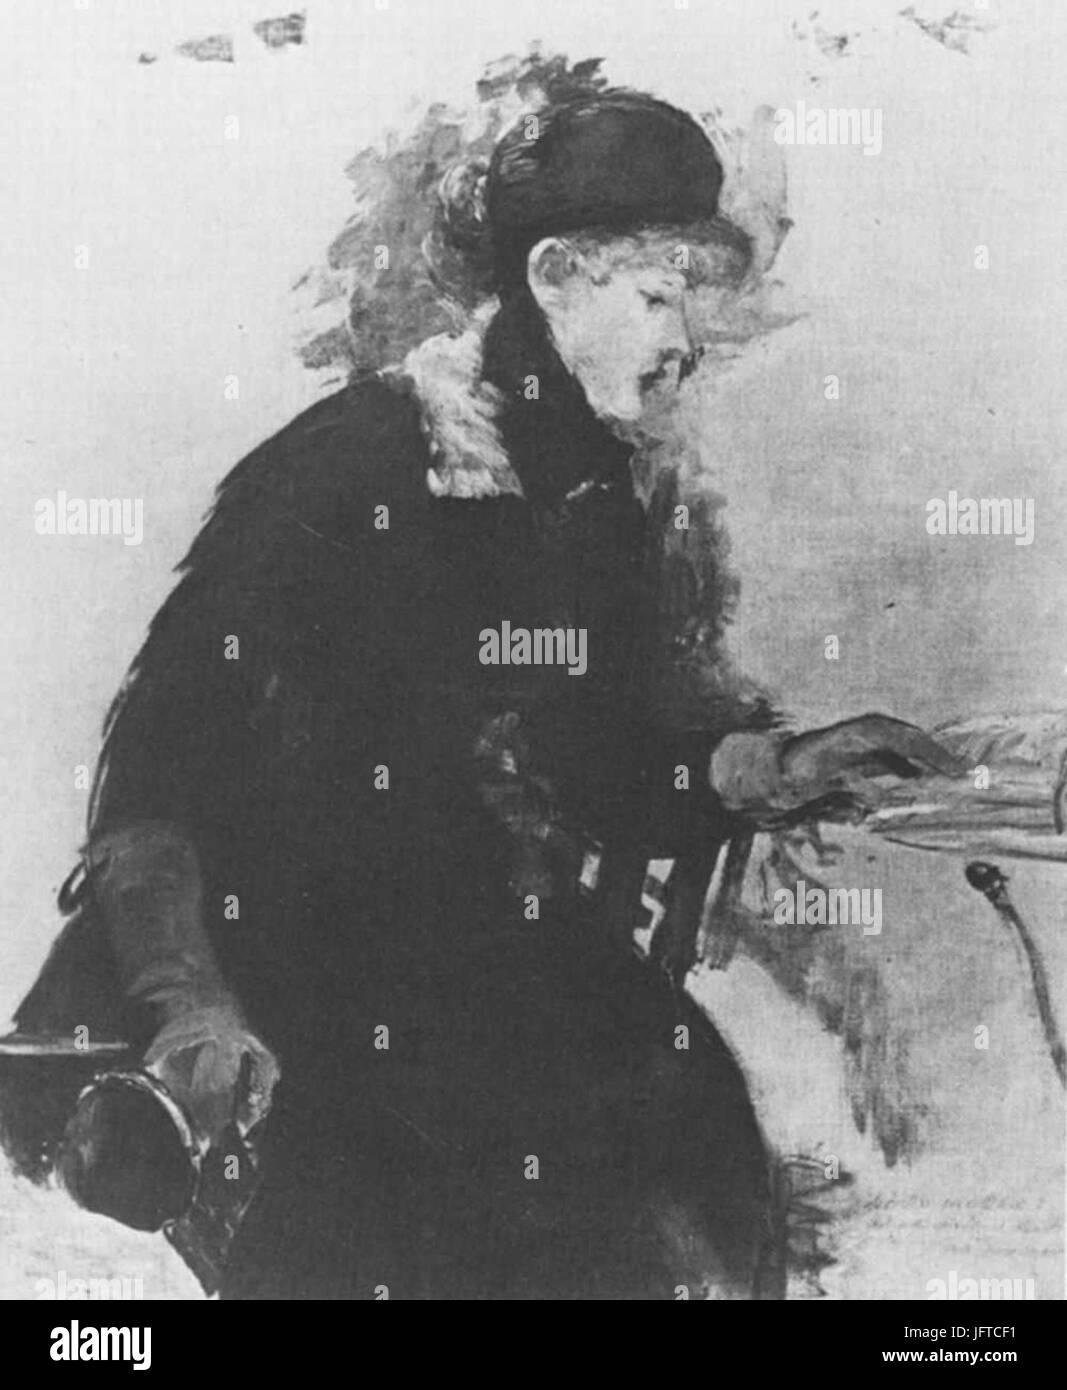 Édouard Manet - Liseuse (RW 398) - Stock Image